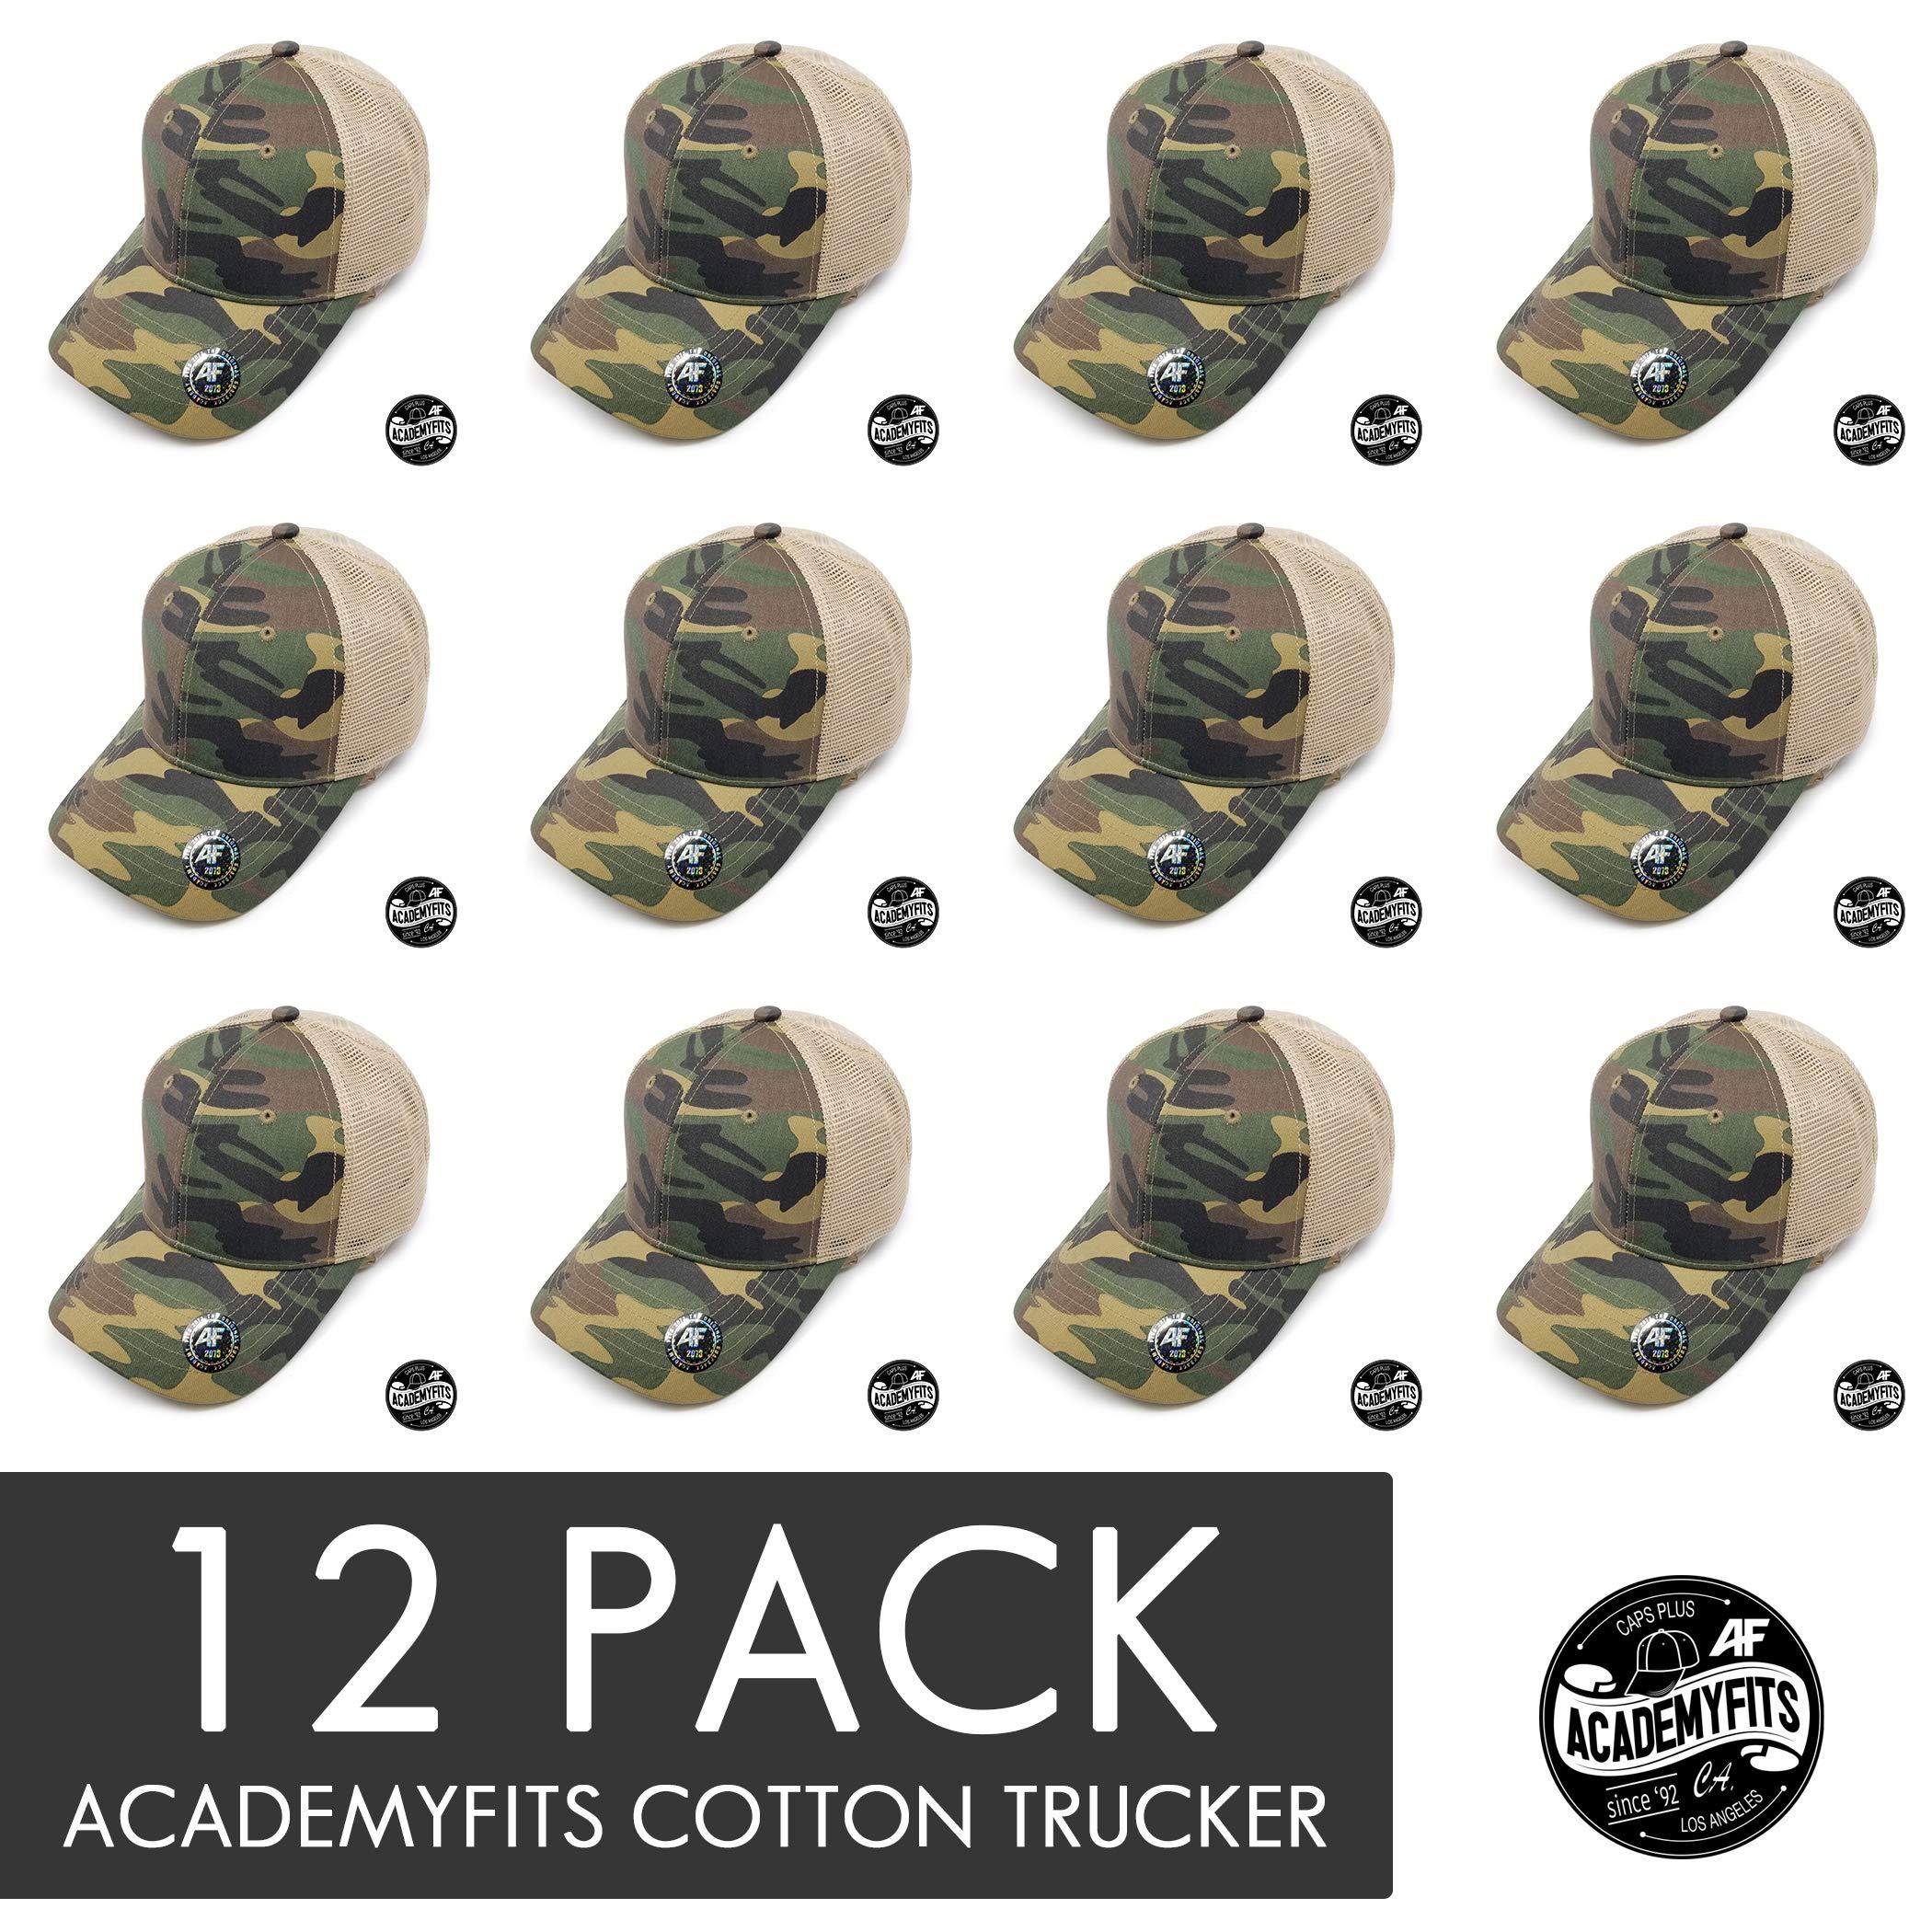 AcademyFits Quality 6 Panel Cotton Trucker Mesh Snapback Curve Visor Men Women Unisex Wholesale 12 Pack Lot (Camo/Khaki (12))